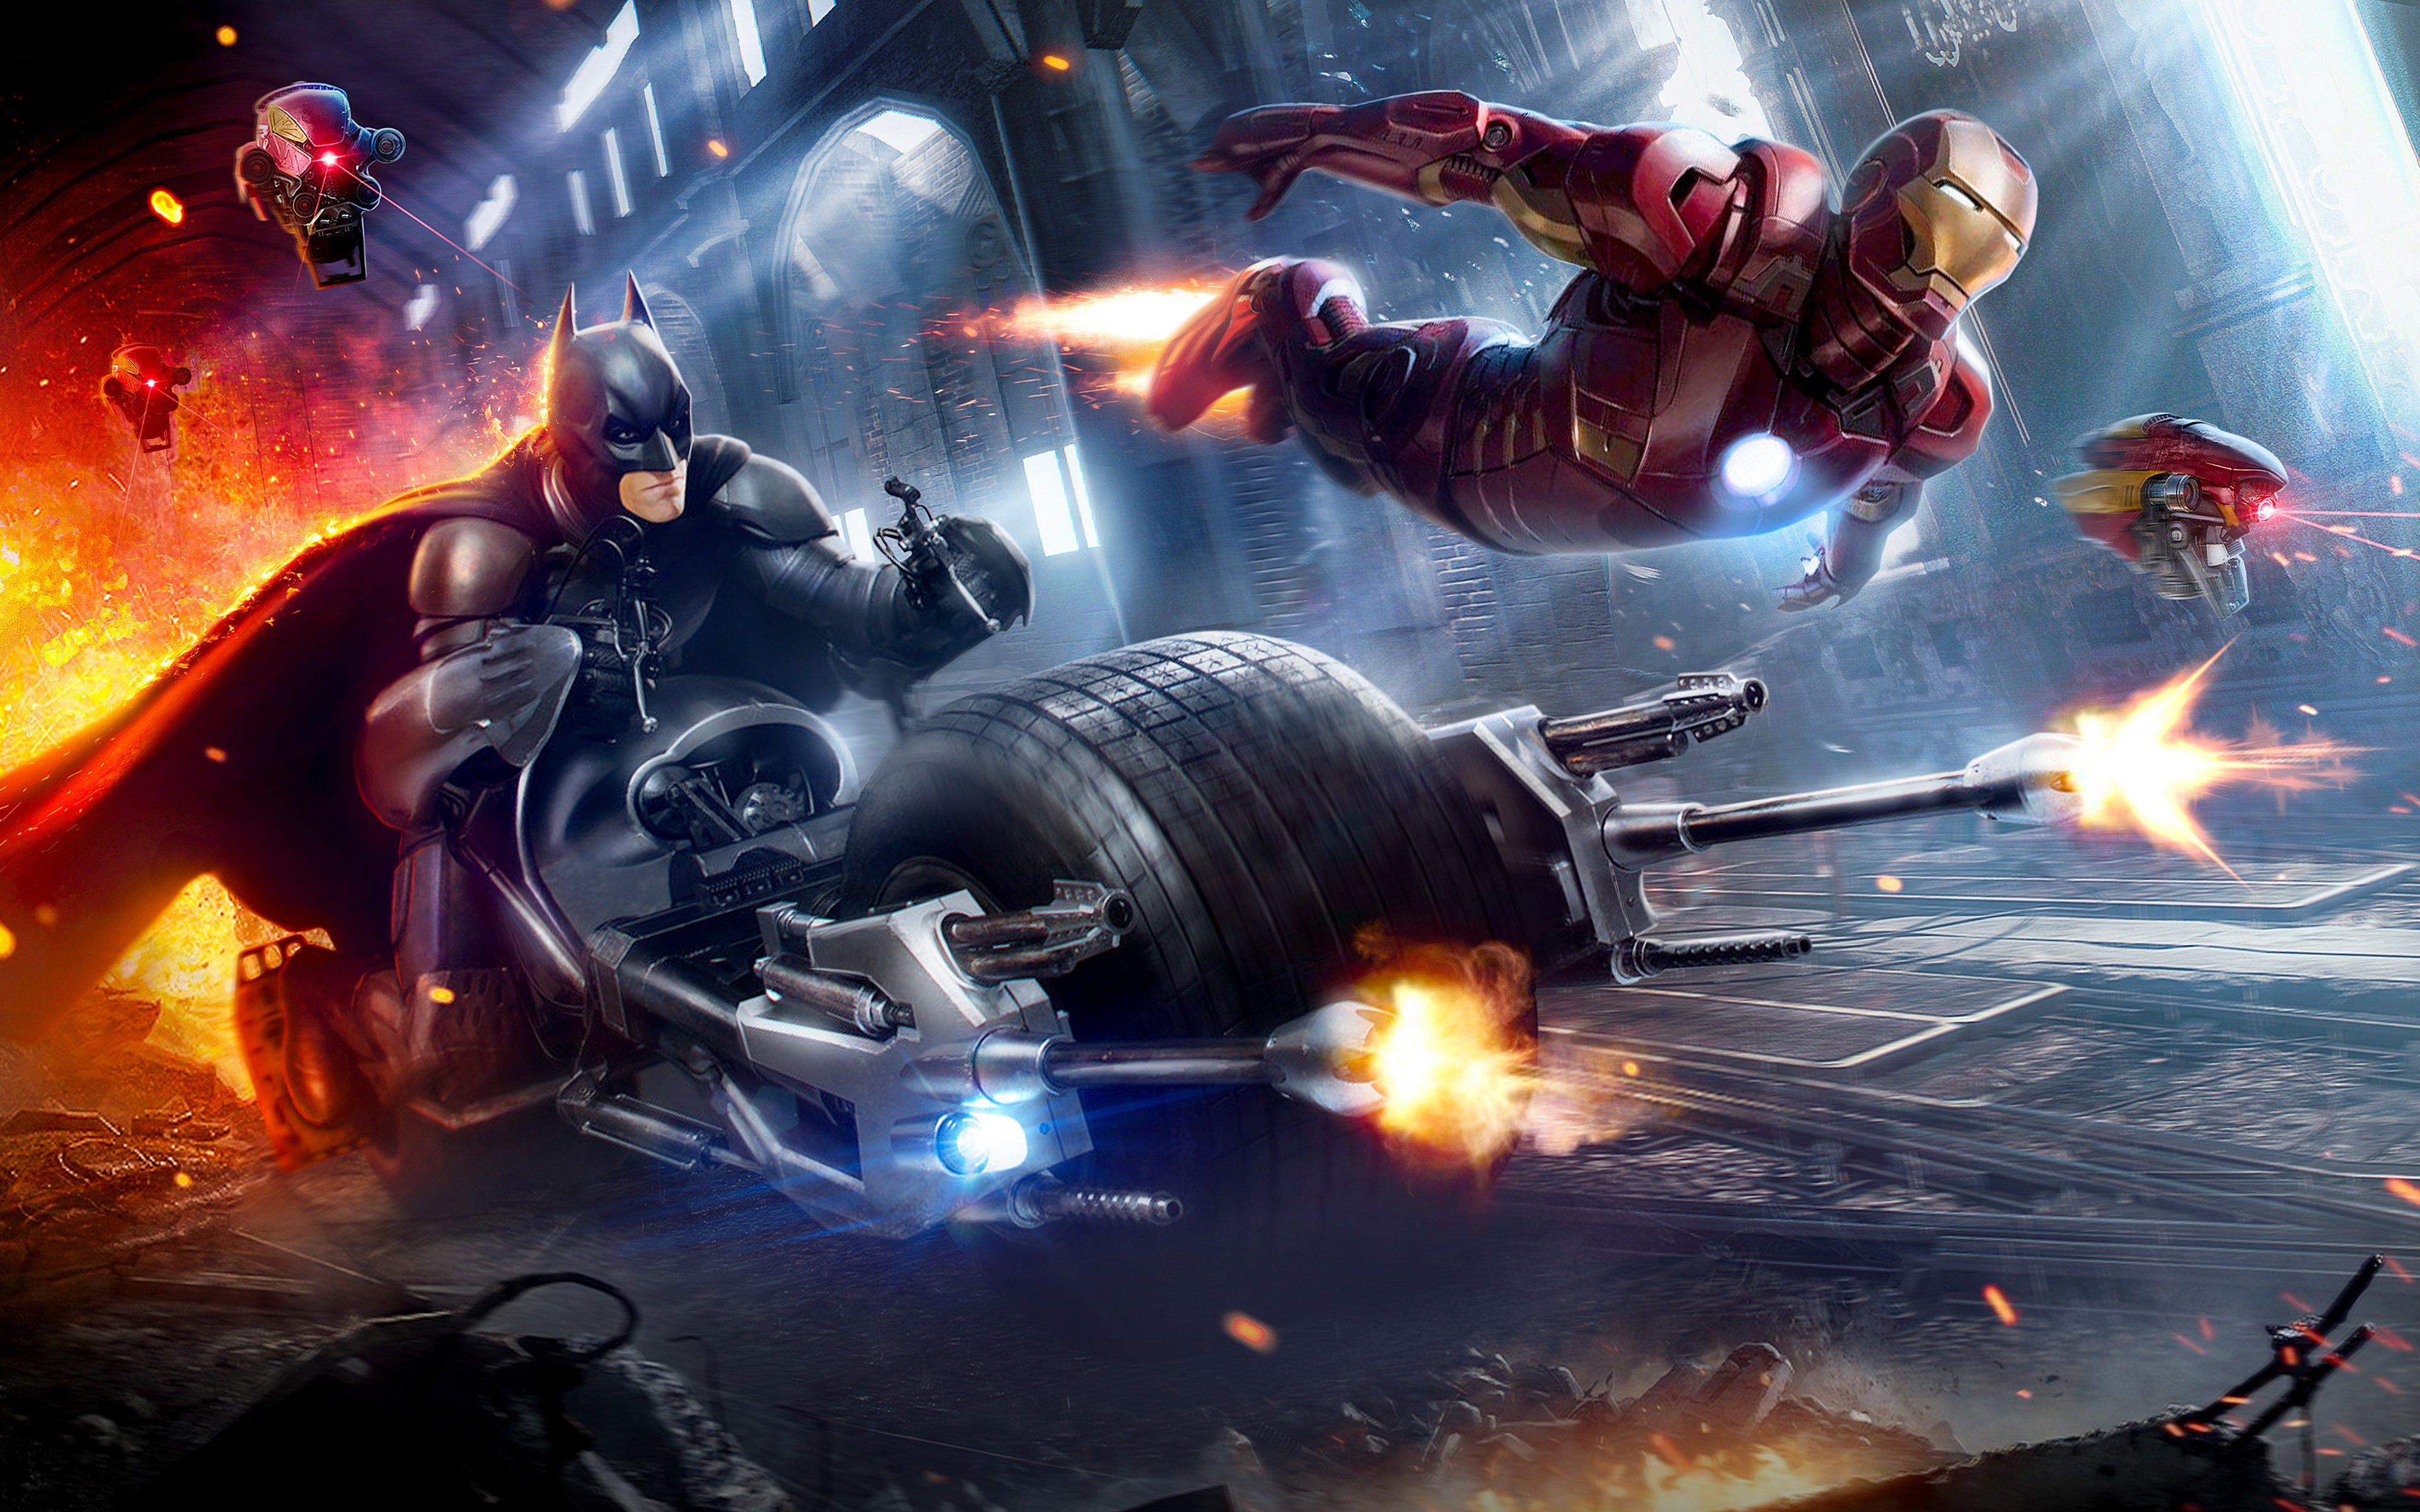 Wallpaper Batman and Iron man